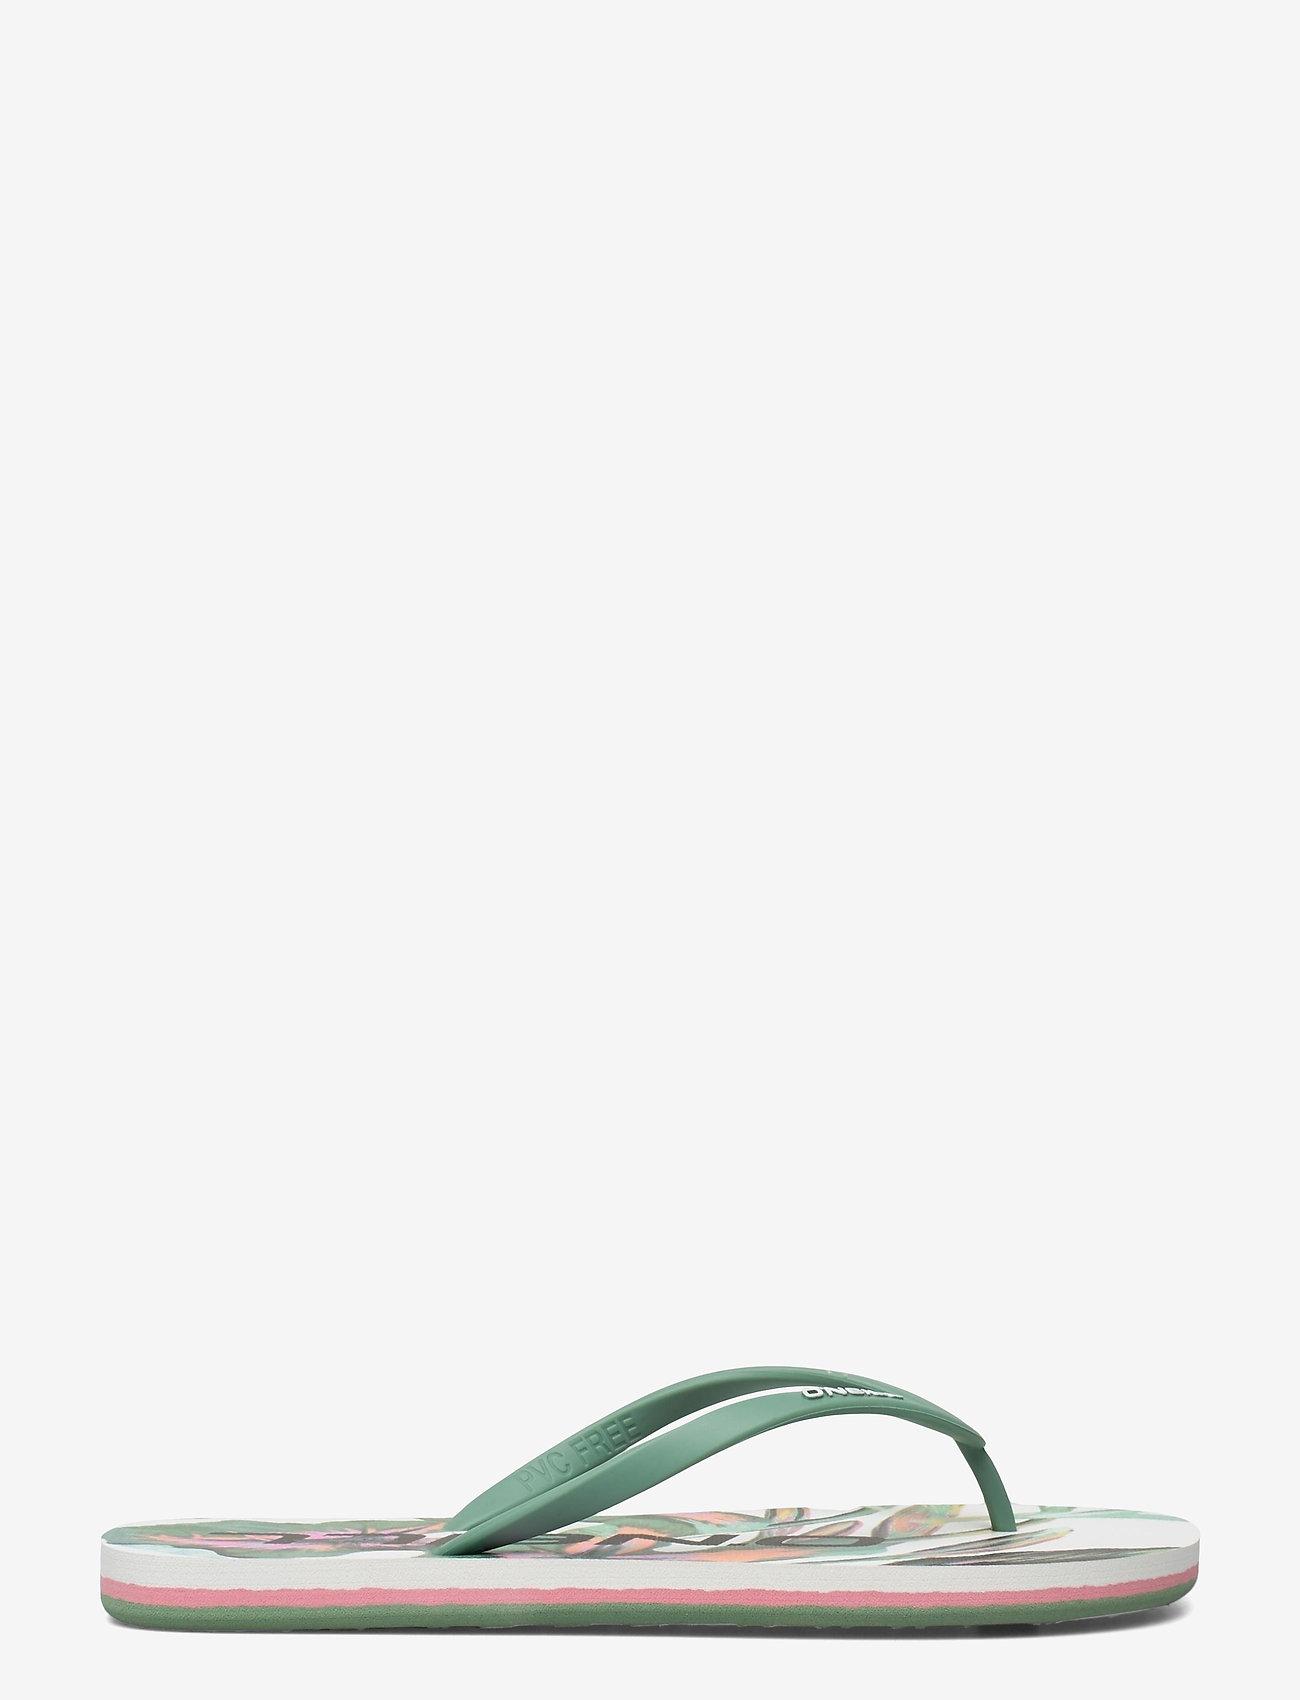 O'Neill - FW PROFILE GRAPHIC SANDALS - sport schoenen - white aop w/green - 1